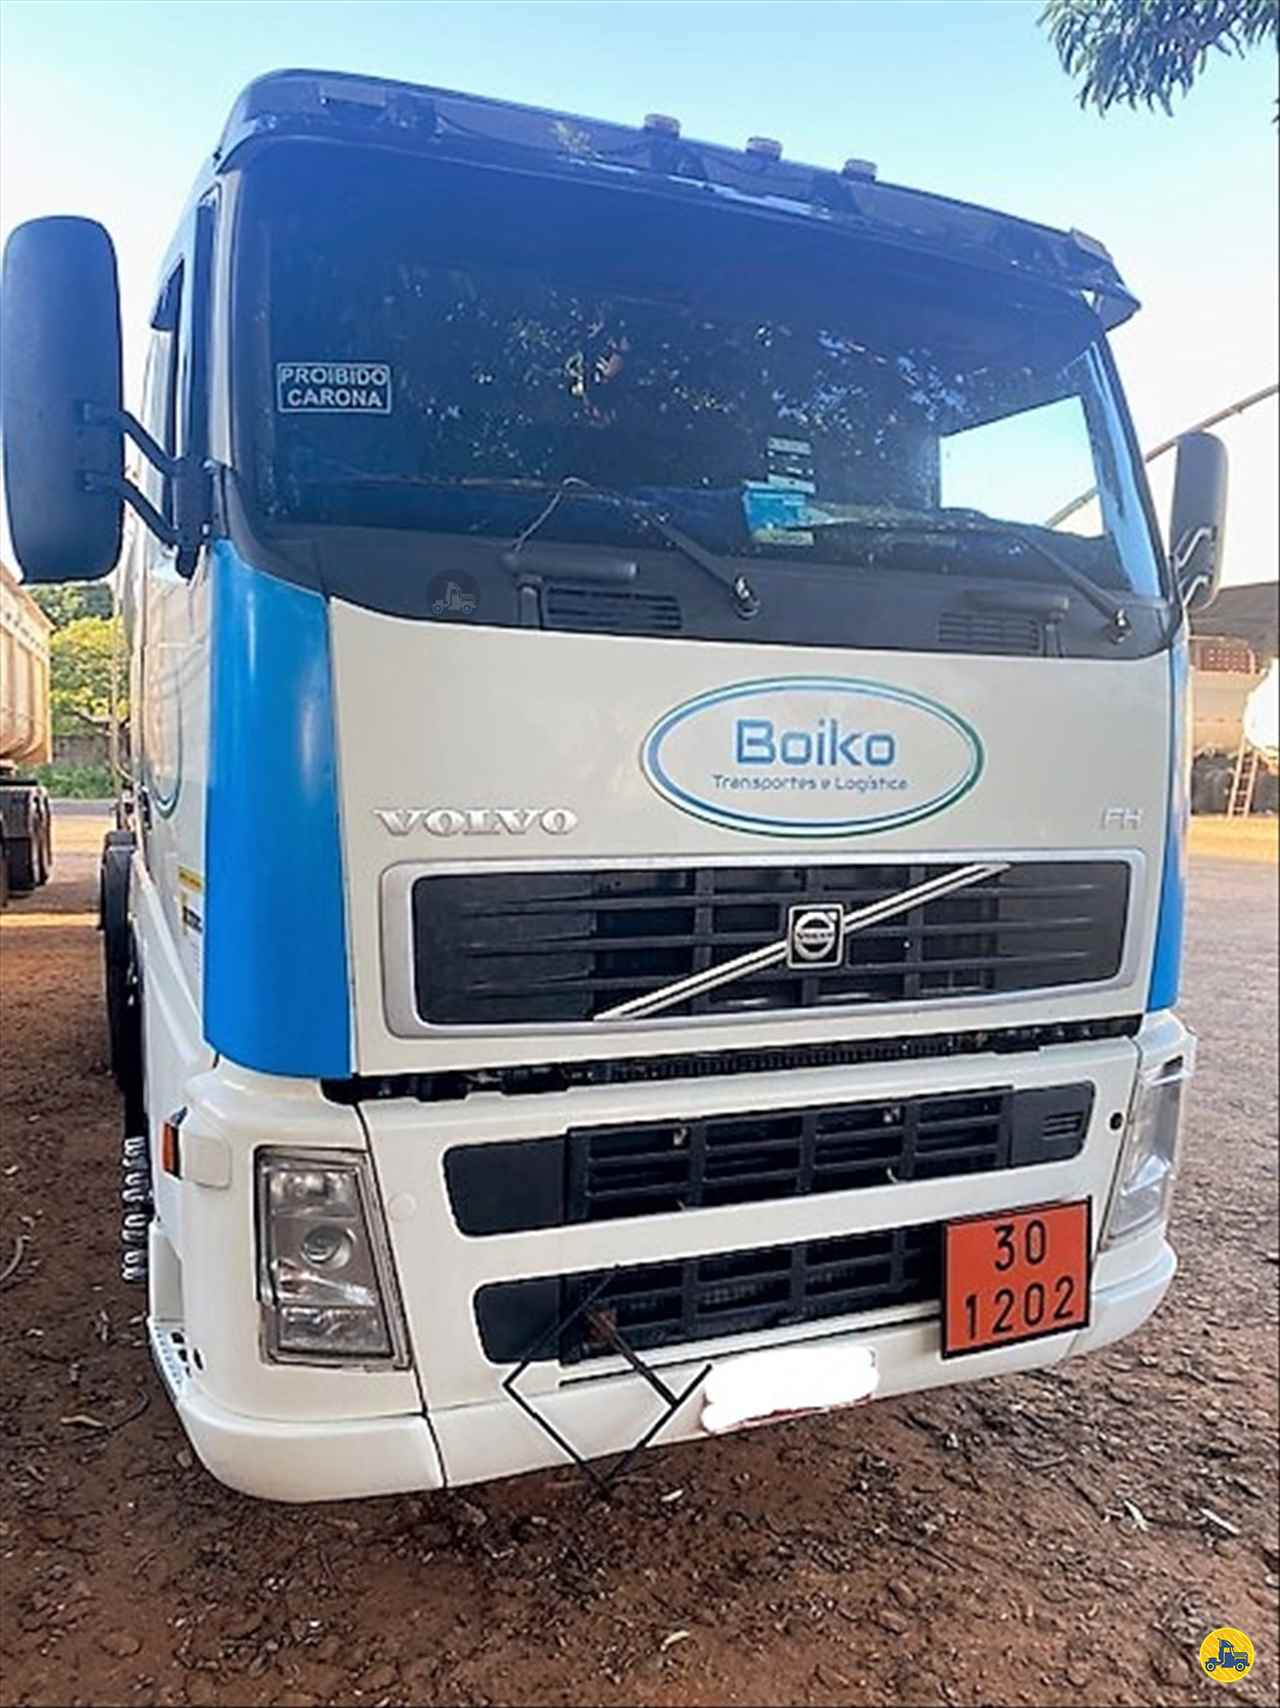 CAMINHAO VOLVO VOLVO FH 440 Cavalo Mecânico Truck 6x2 BOIKO Transportes e Logistica Eireli CAMPO GRANDE MATO GROSSO DO SUL MS